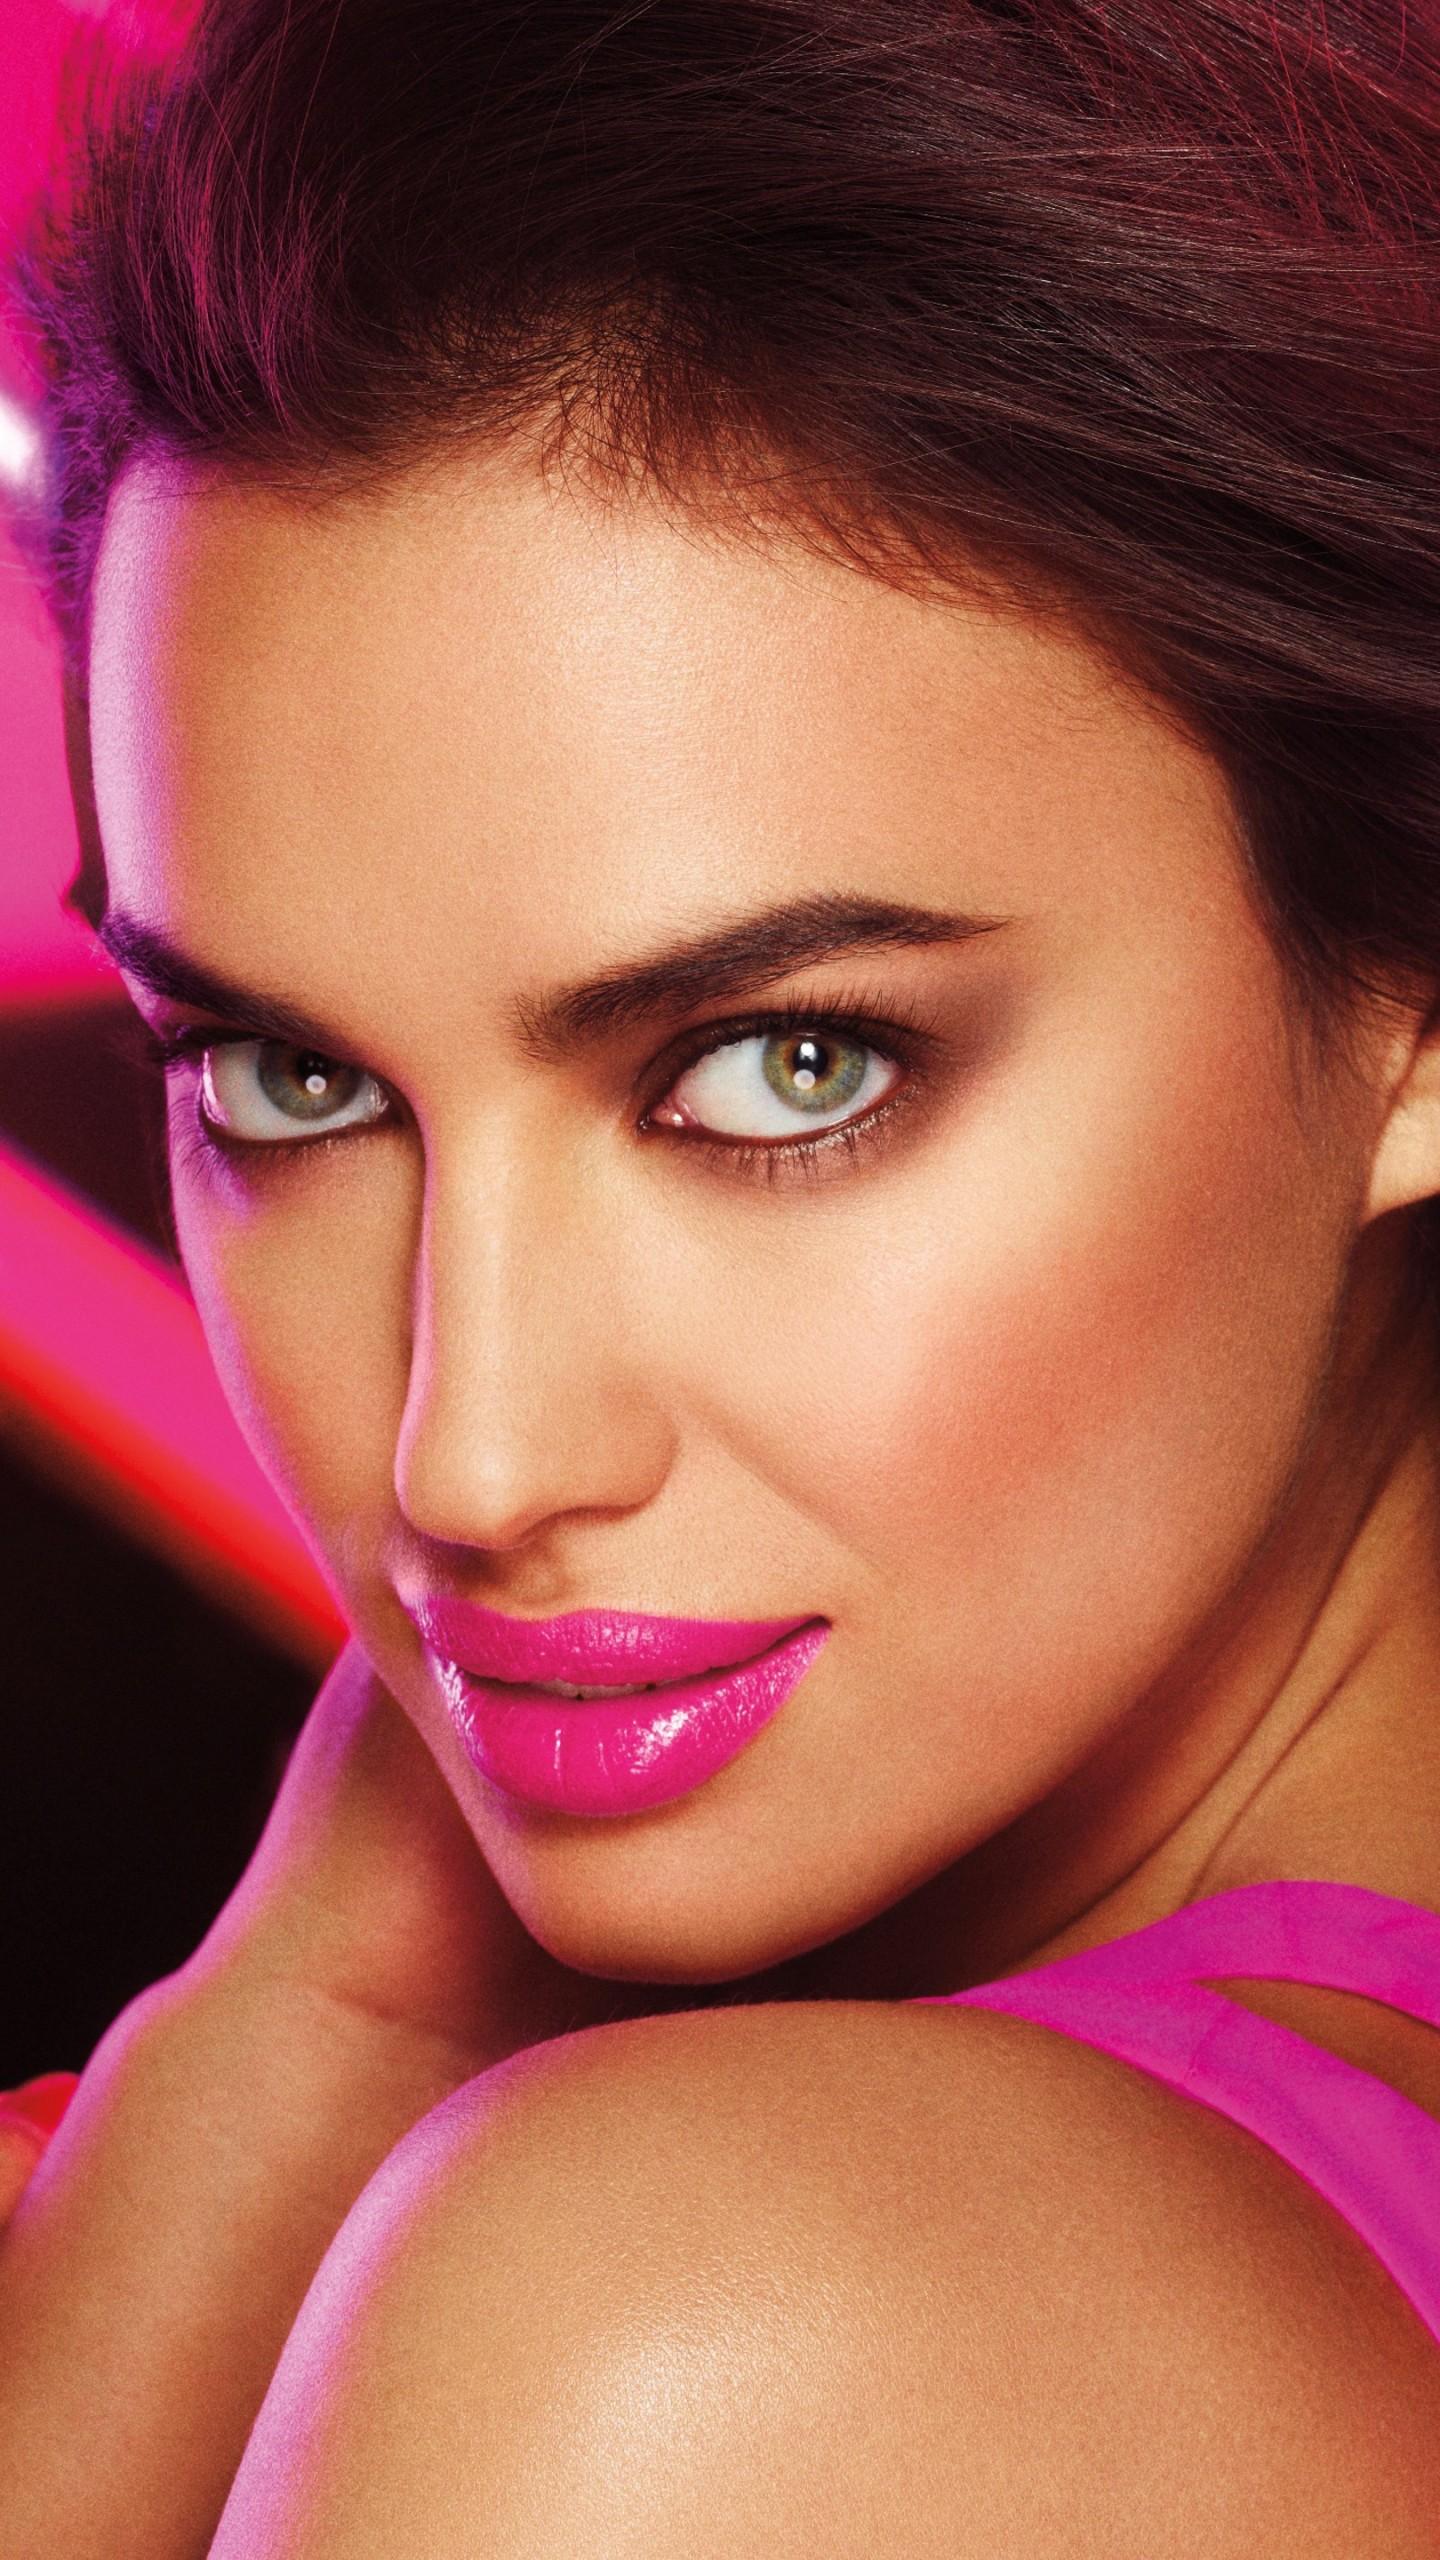 Wallpaper Irina Shayk, Top Fashion Models, model, brunette ...